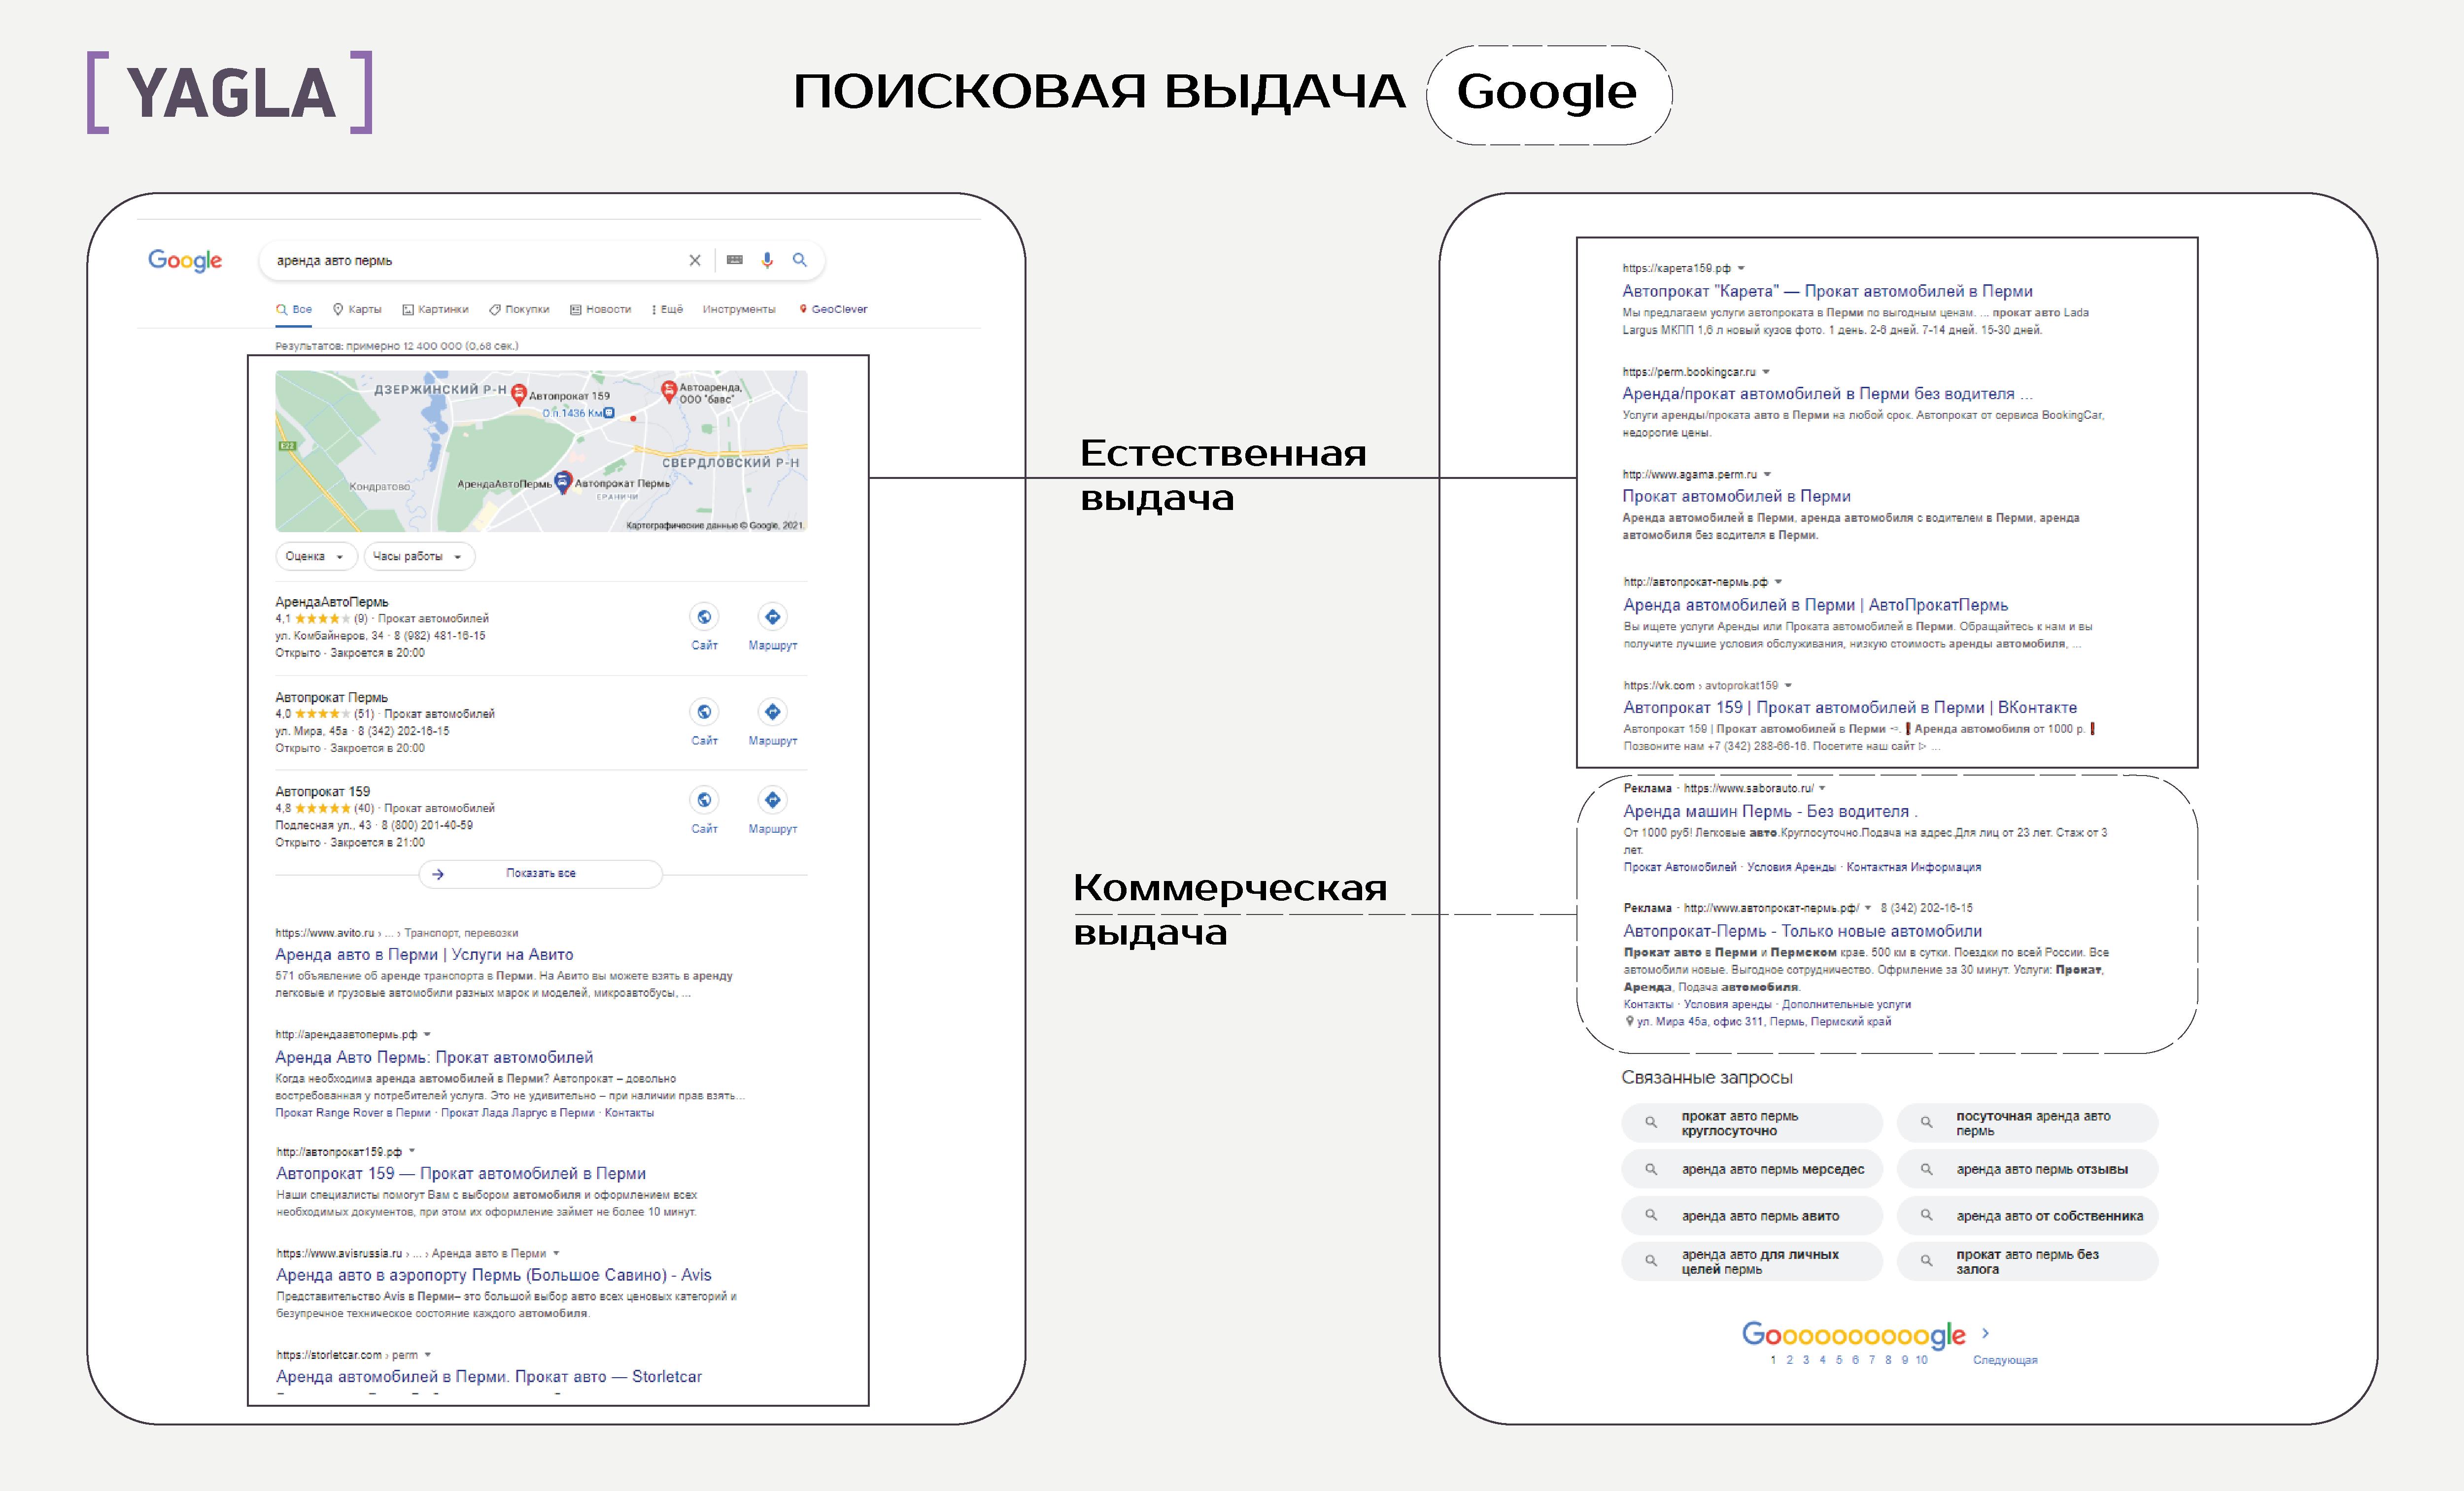 Пример страницы SERP Google